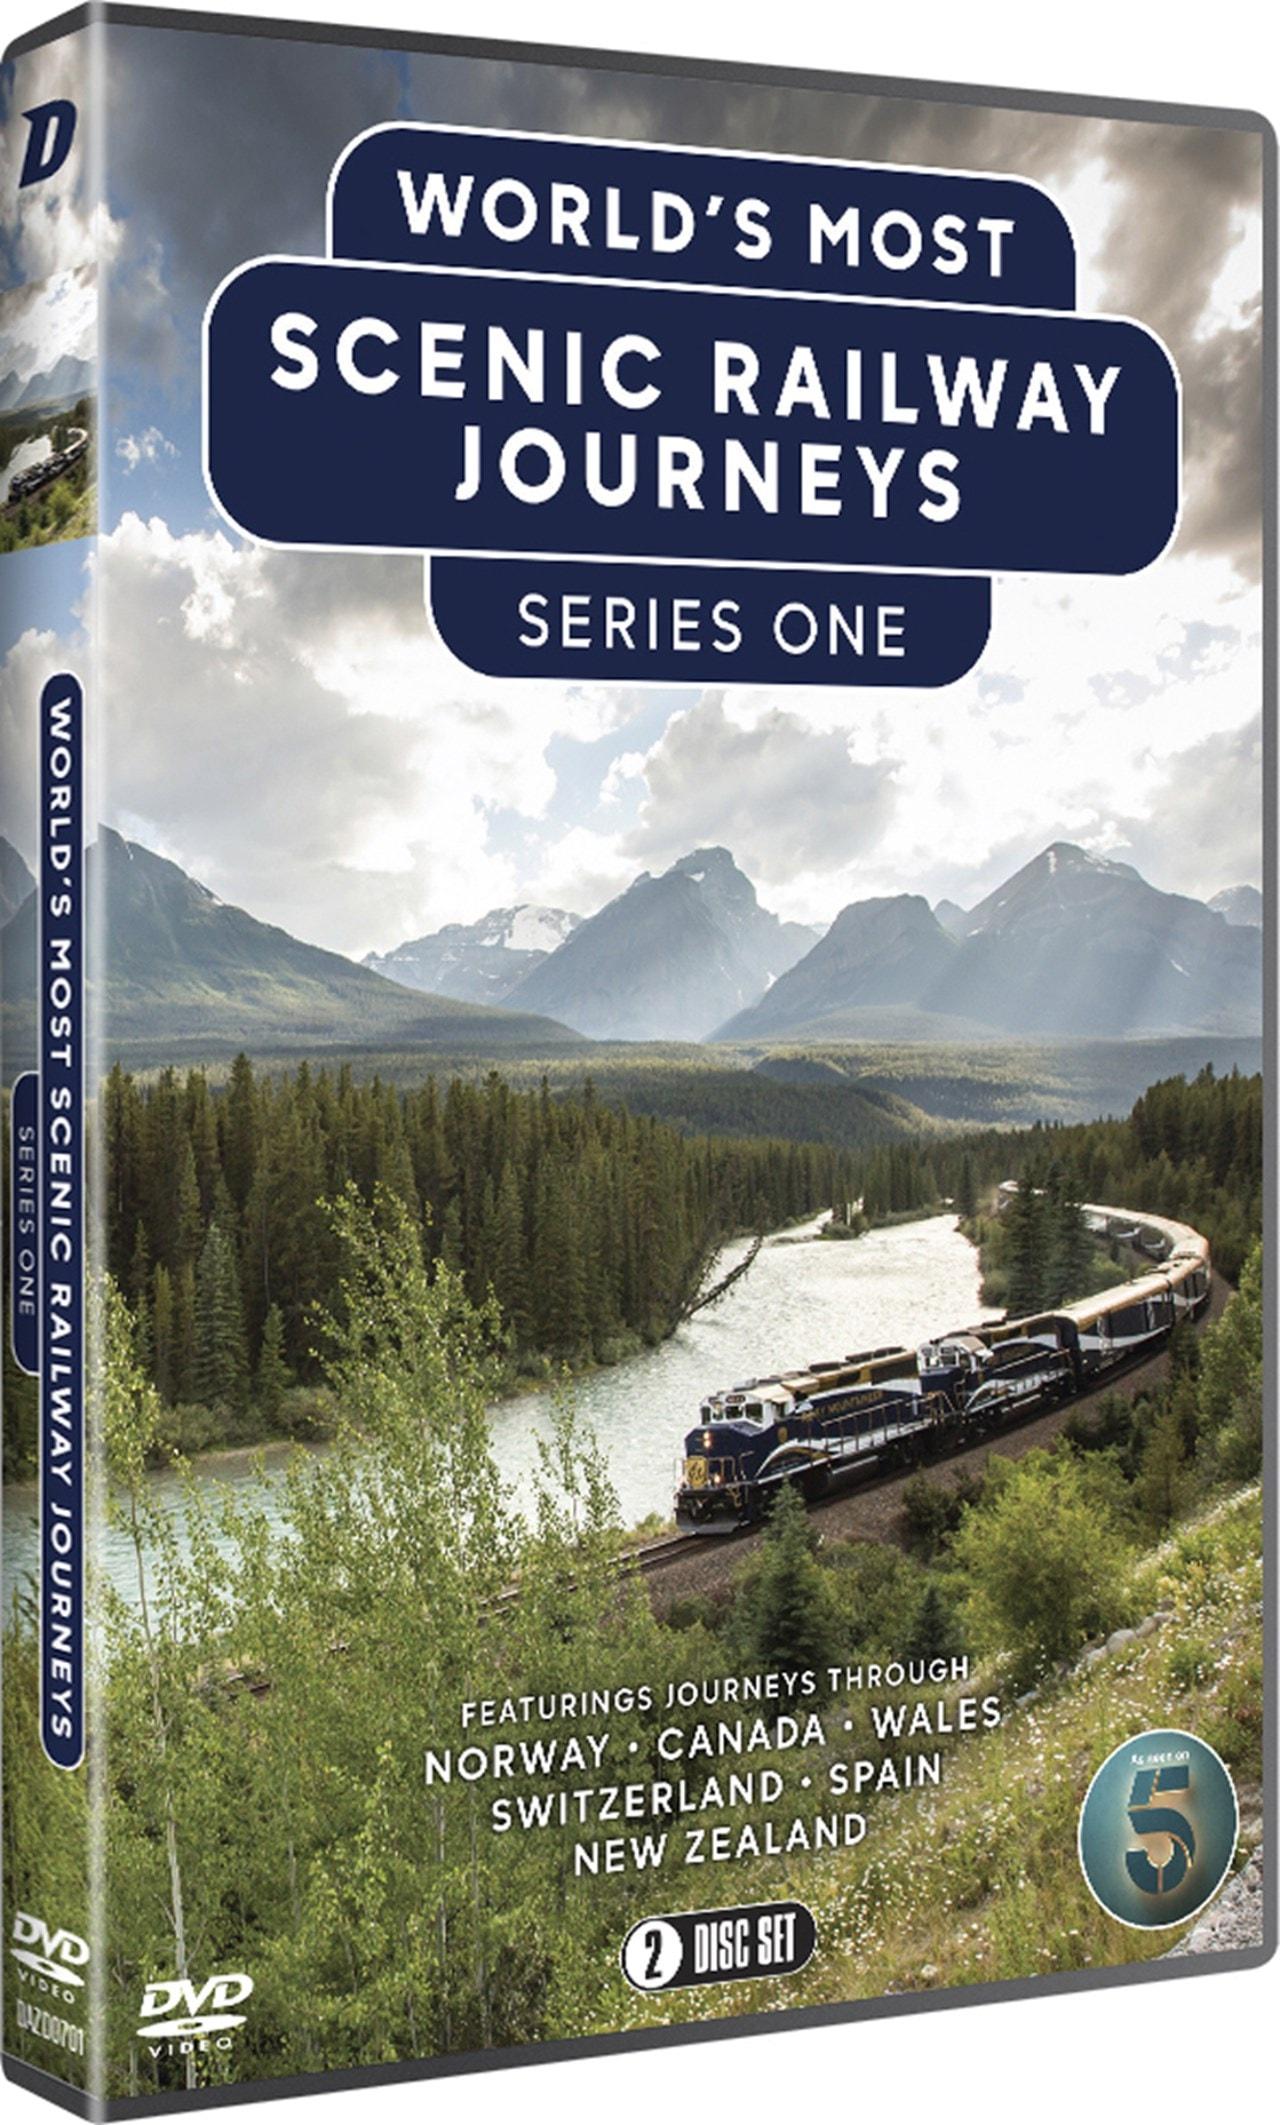 The World's Most Scenic Railway Journeys: Series 1 - 2